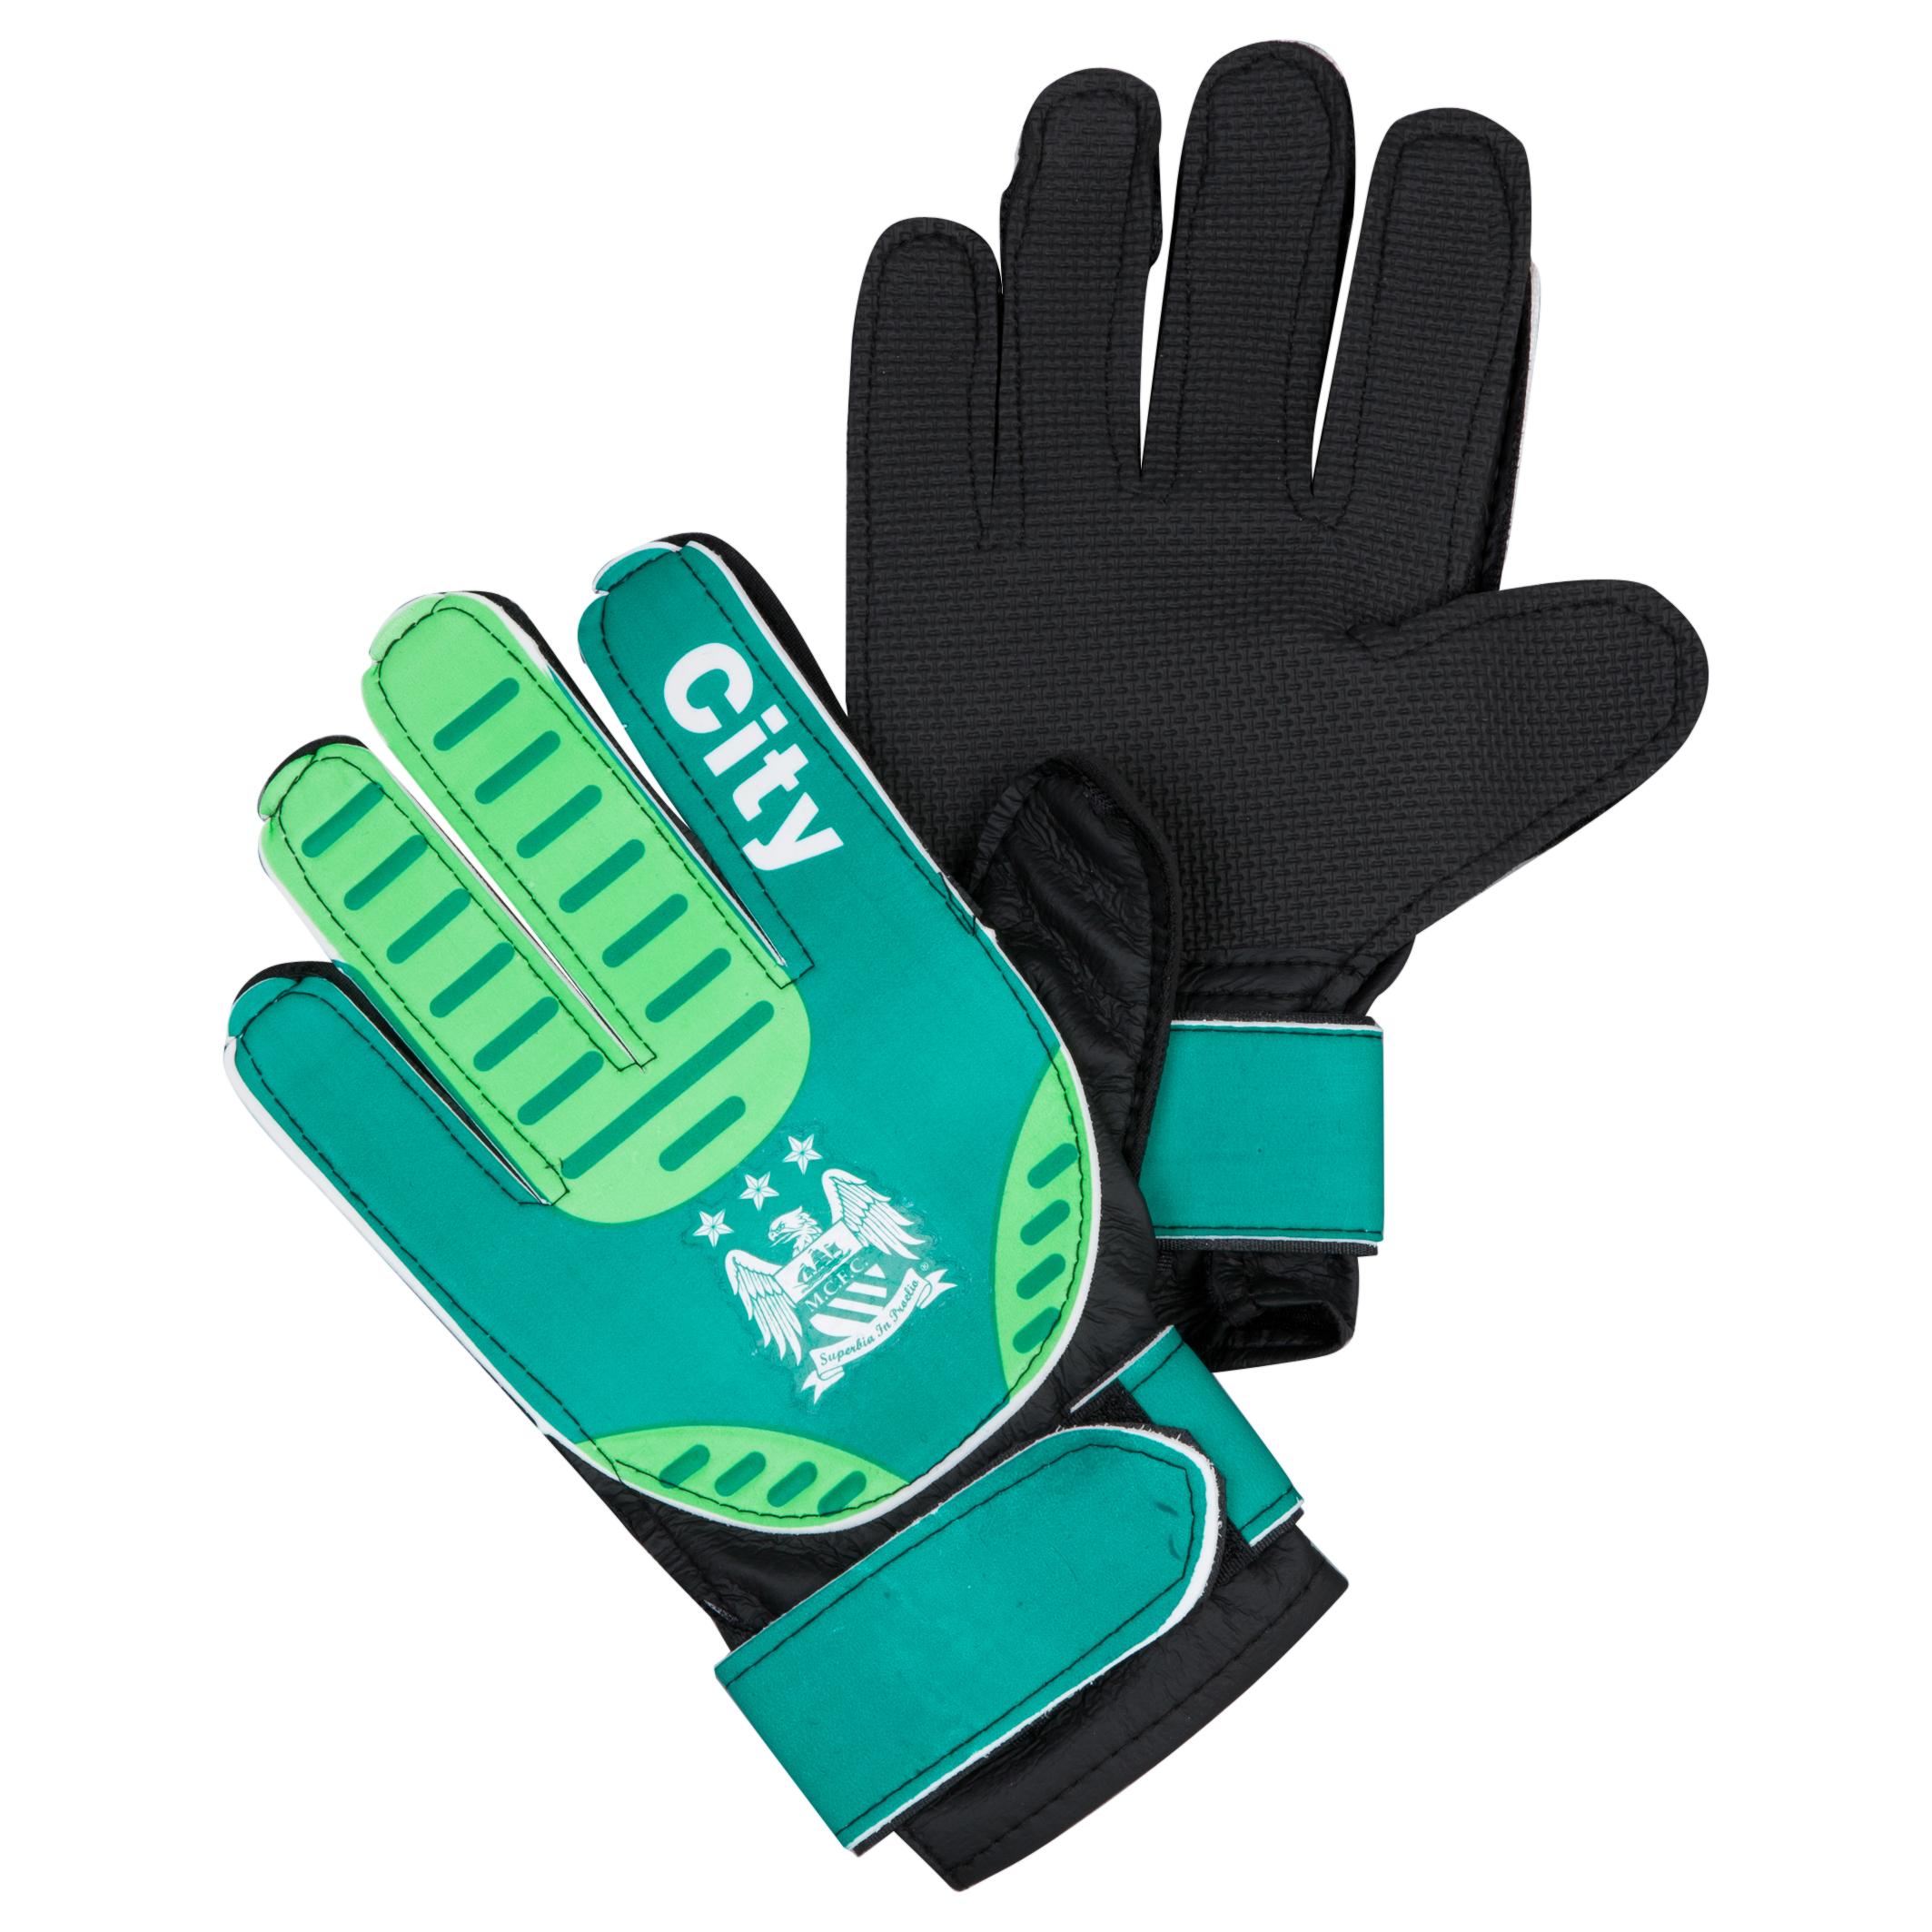 Manchester City Goalkeeper Gloves